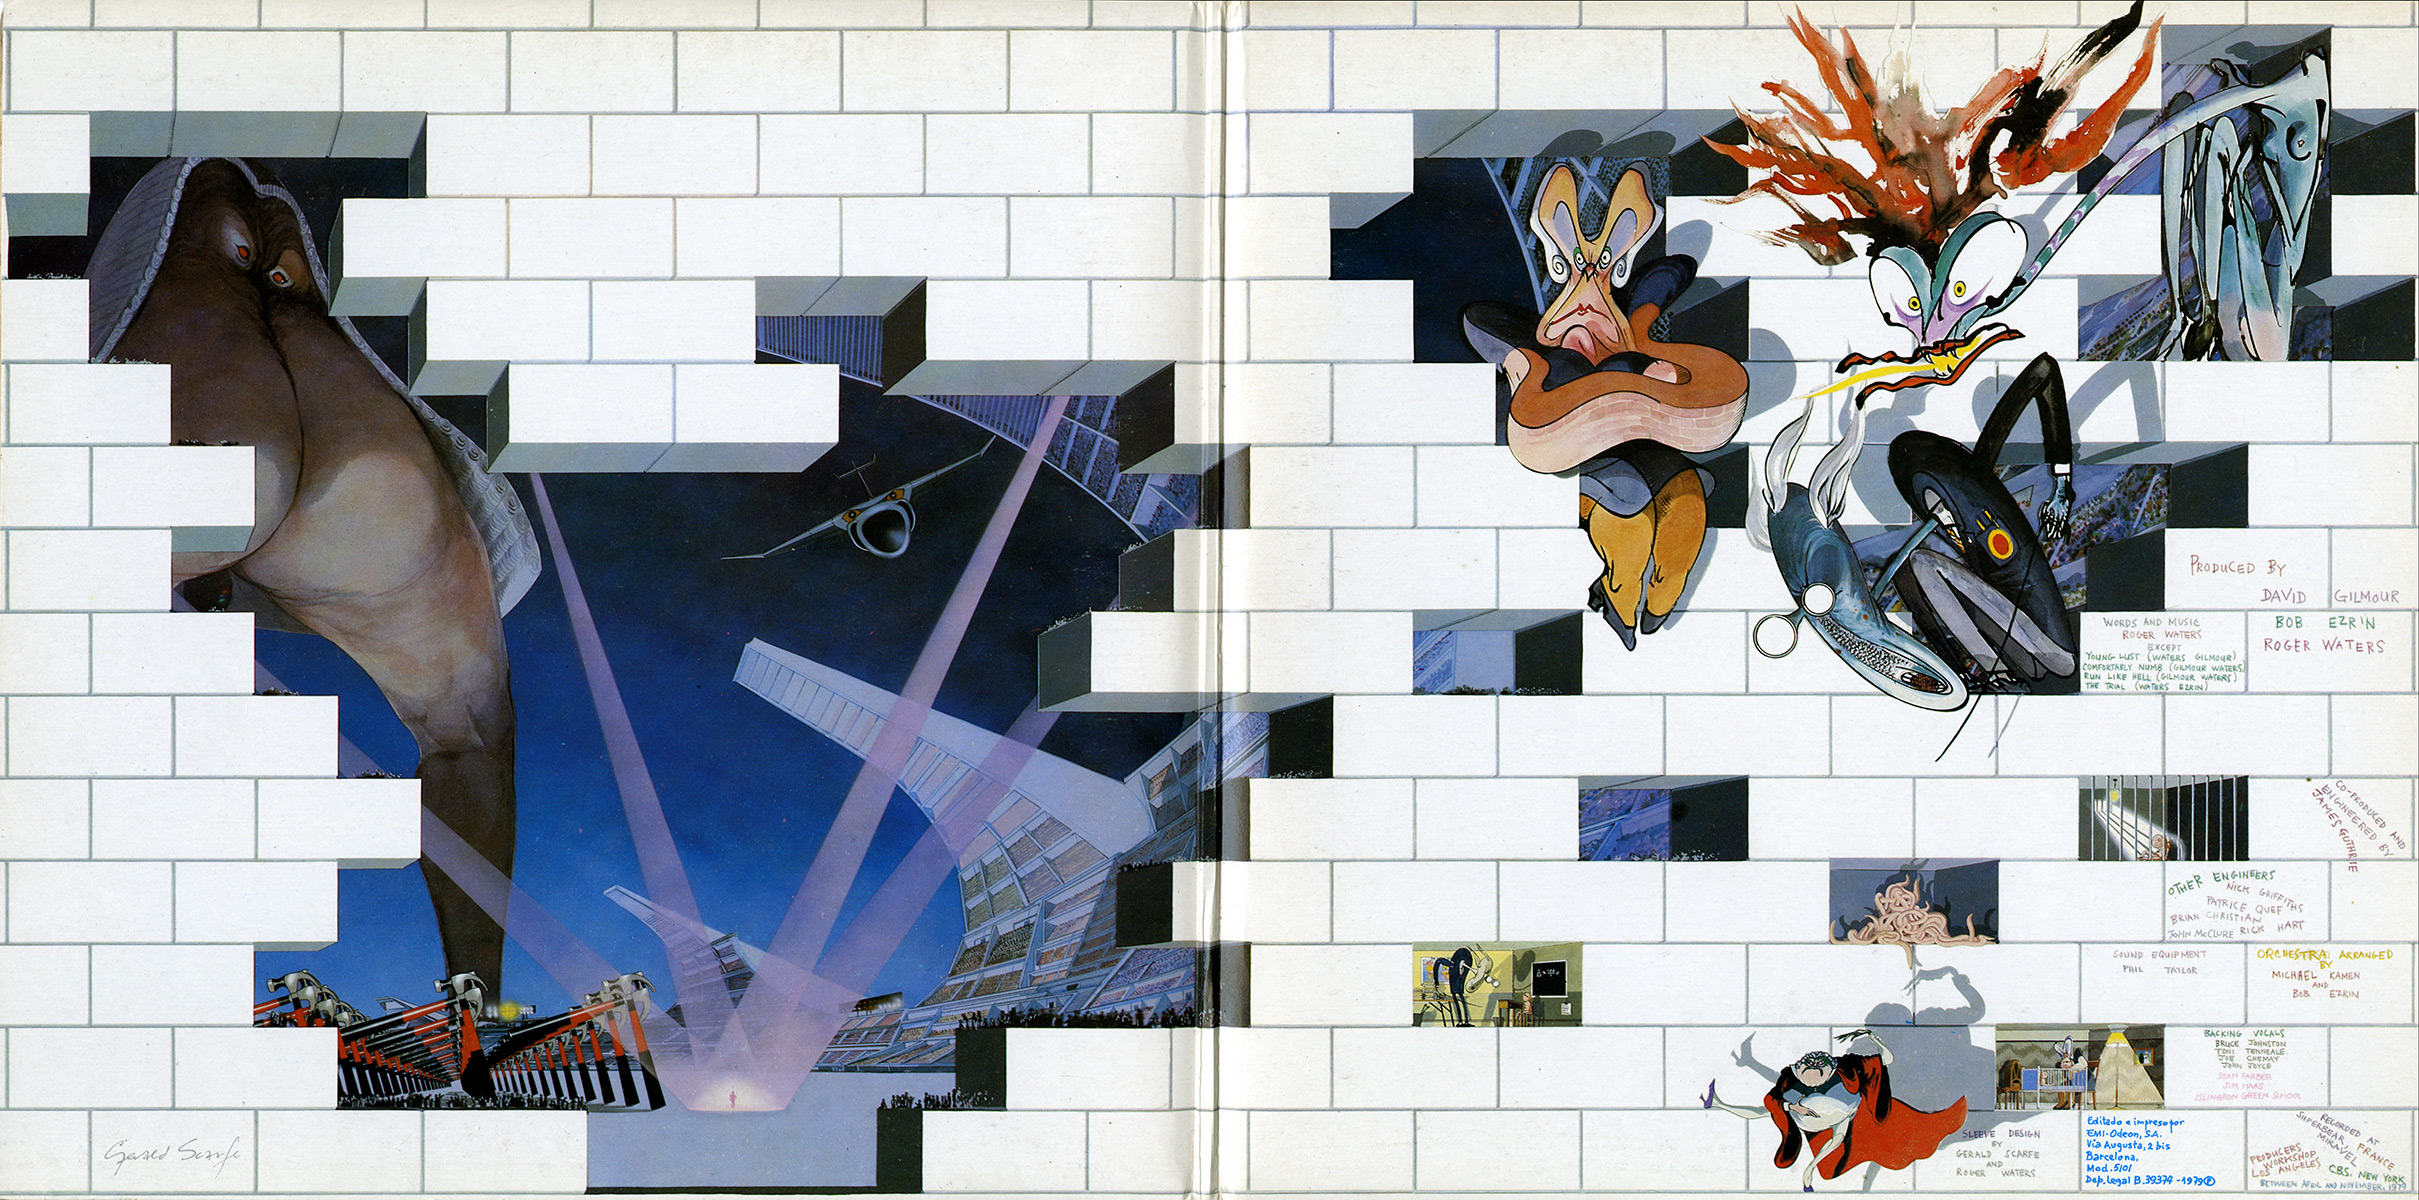 Duvar – The Wall – Pink Floyd